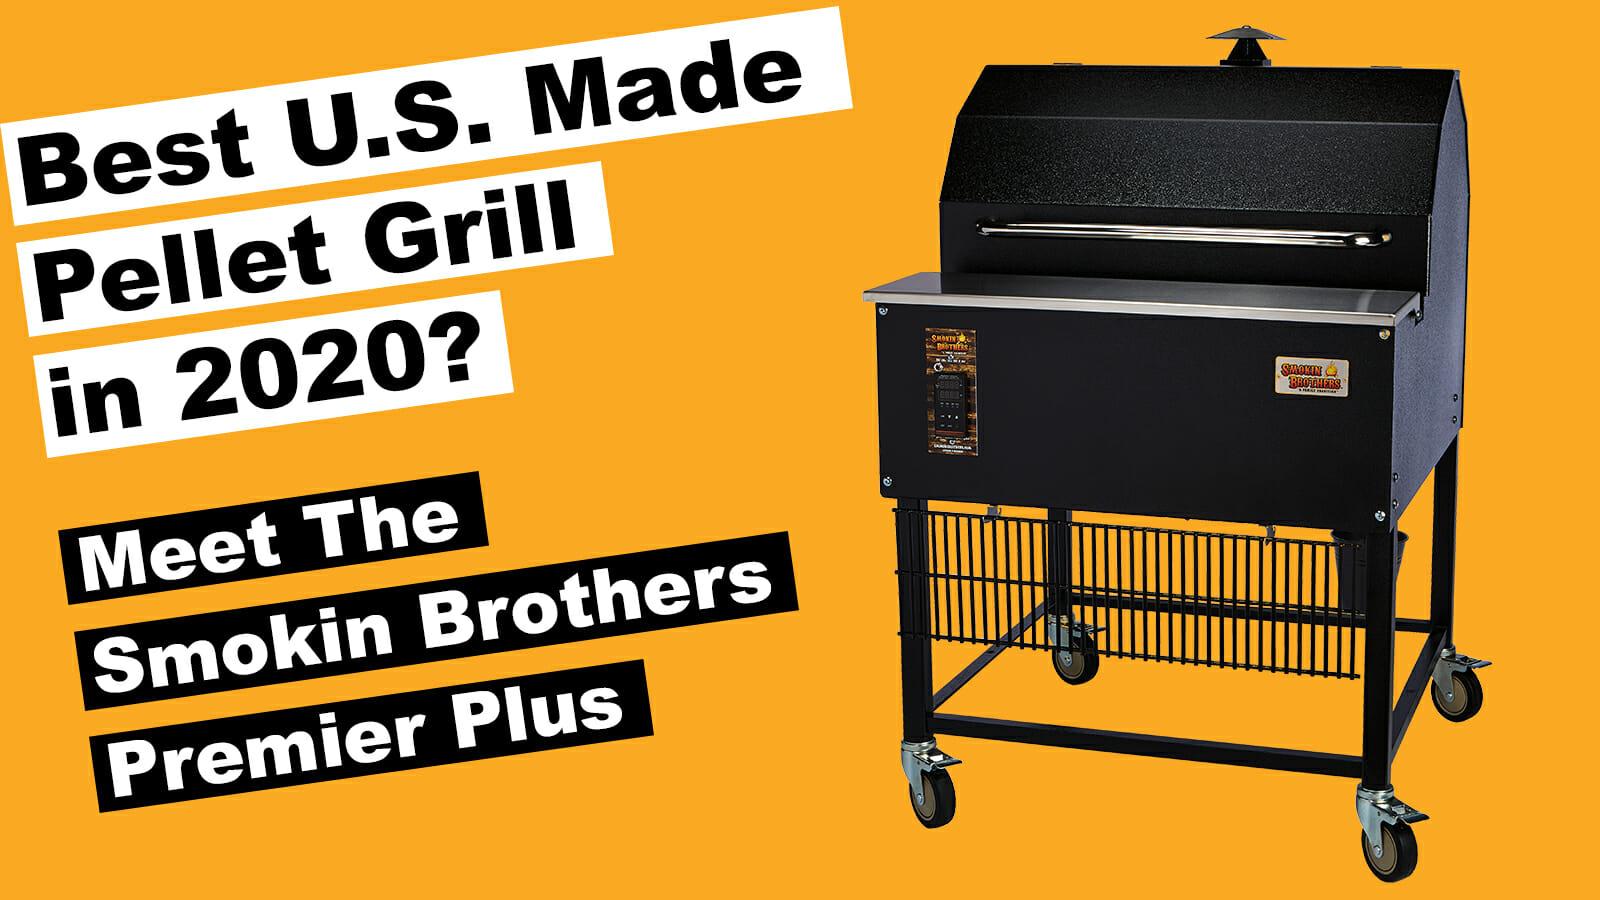 Smokin Brothers Premier Plus Pellet Grill